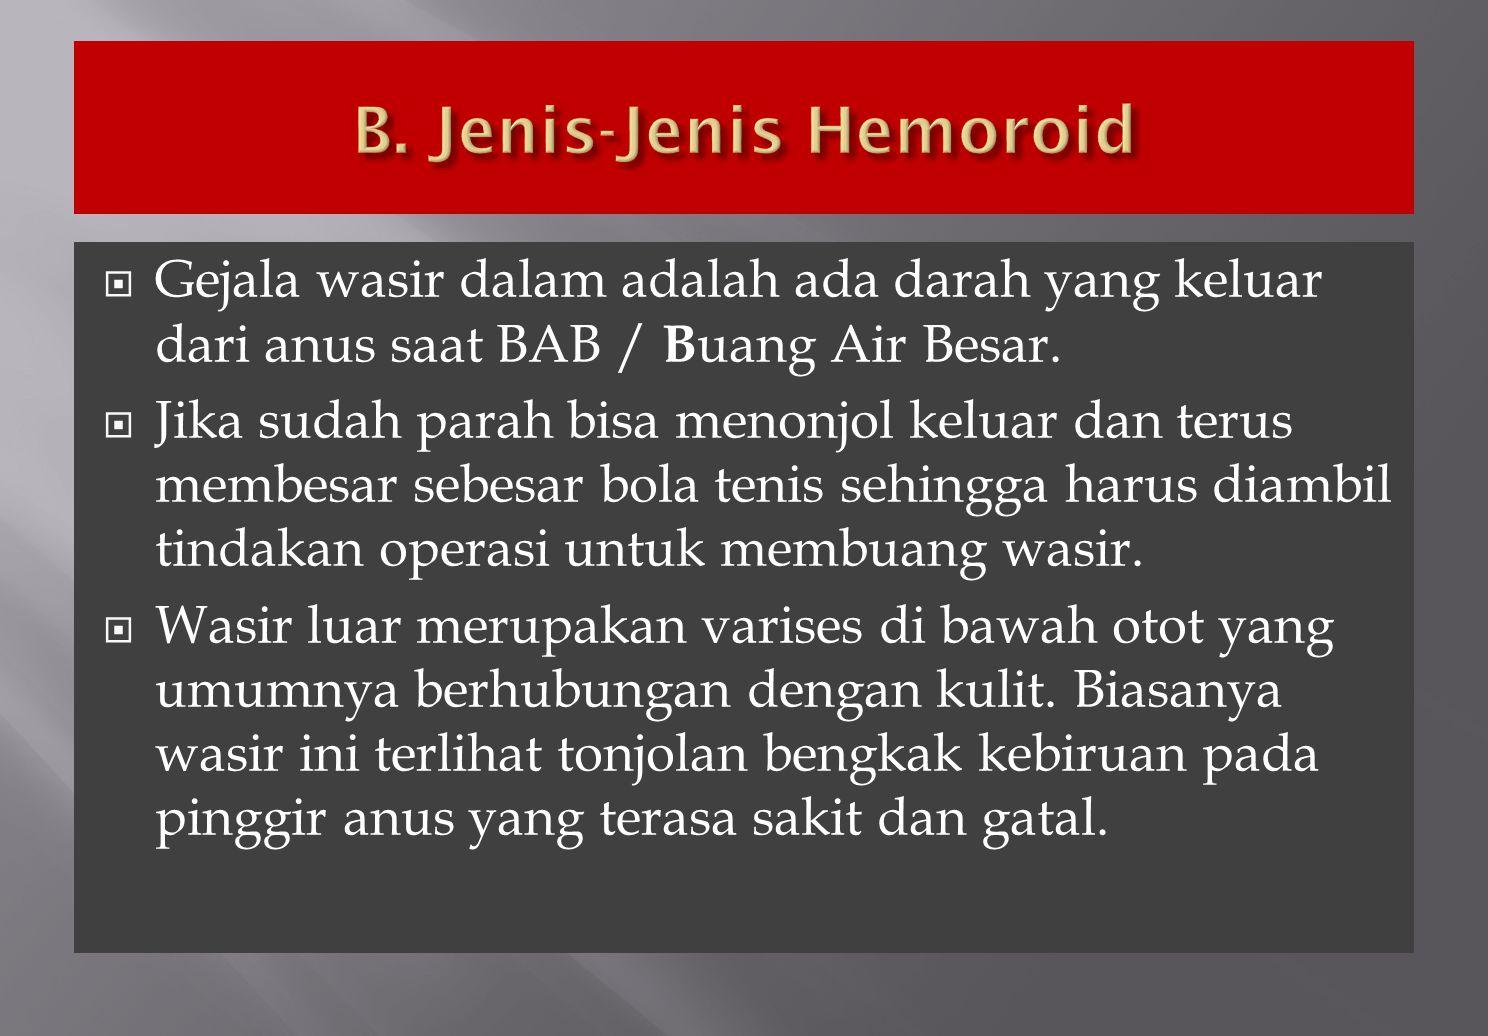 B. Jenis-Jenis Hemoroid